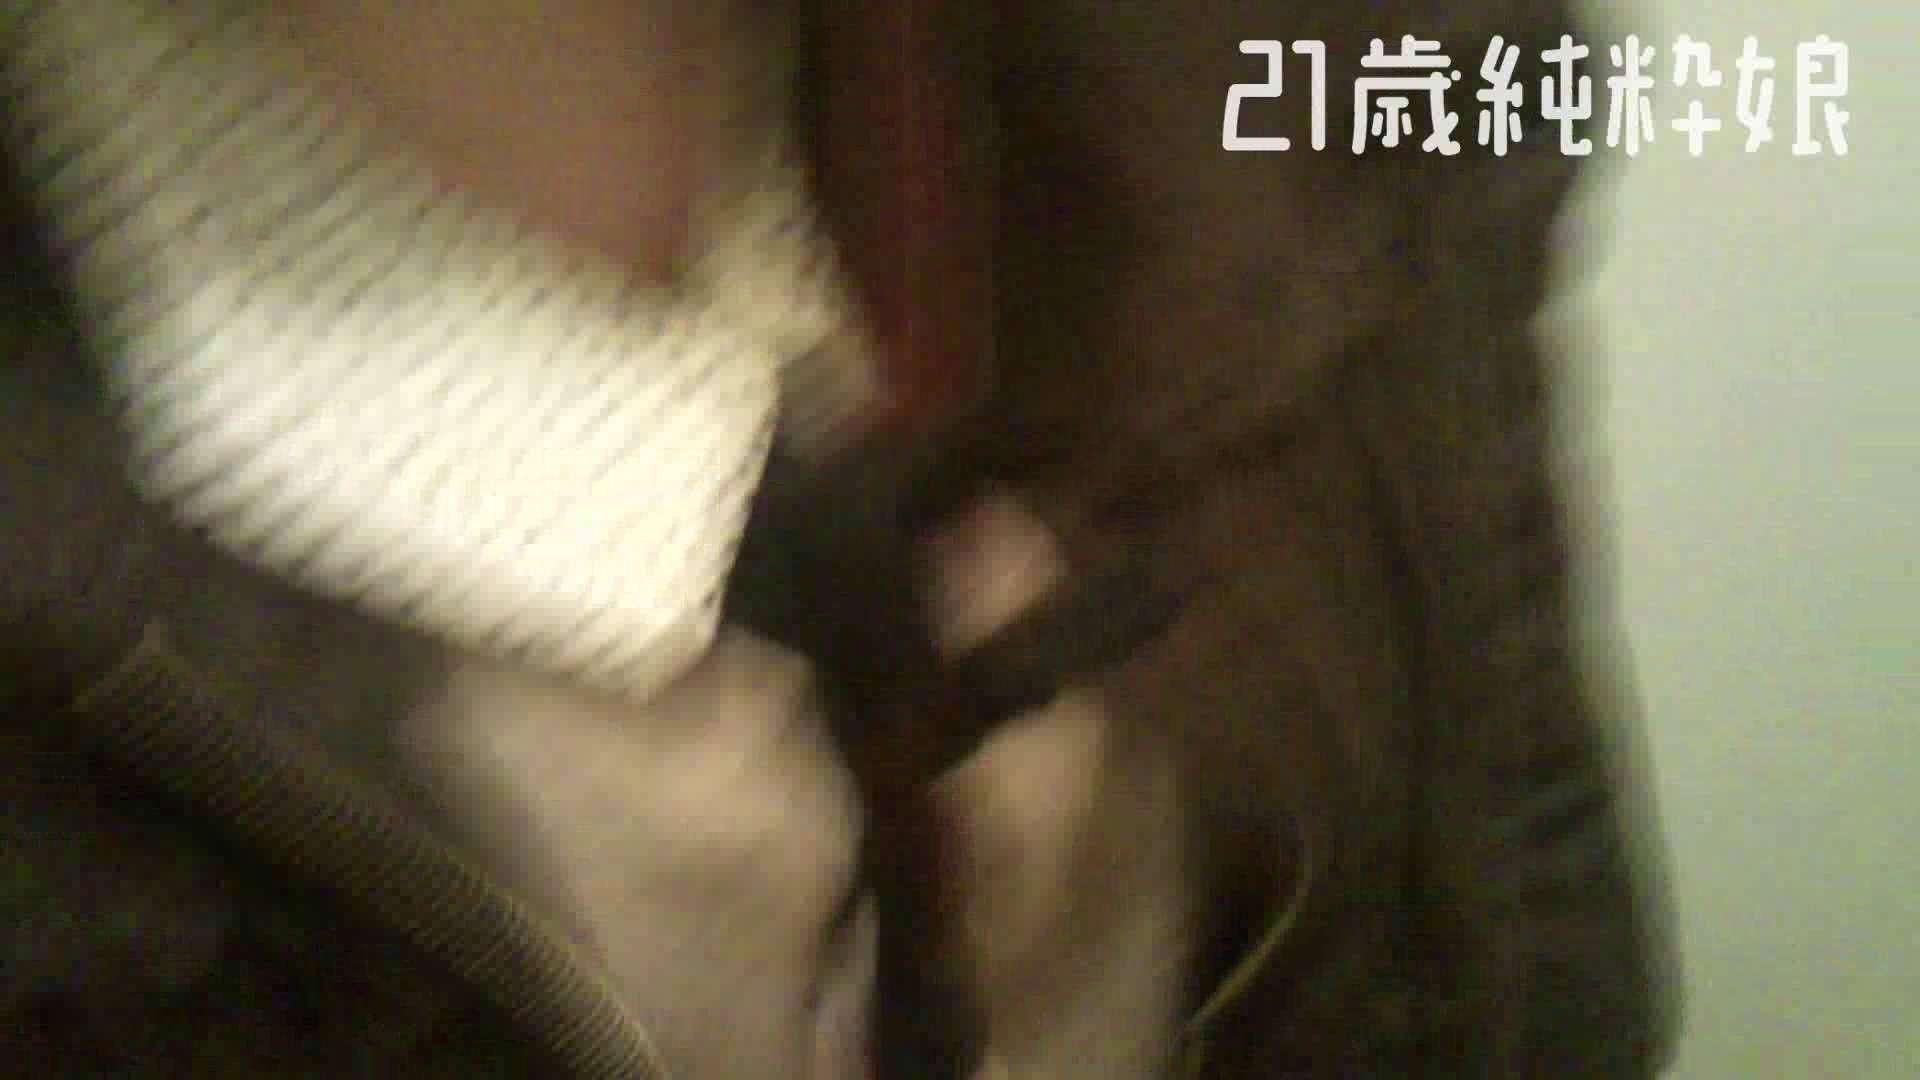 Gカップ21歳純粋嬢第2弾Vol.5 OLのエロ生活 ヌード画像 108連発 83